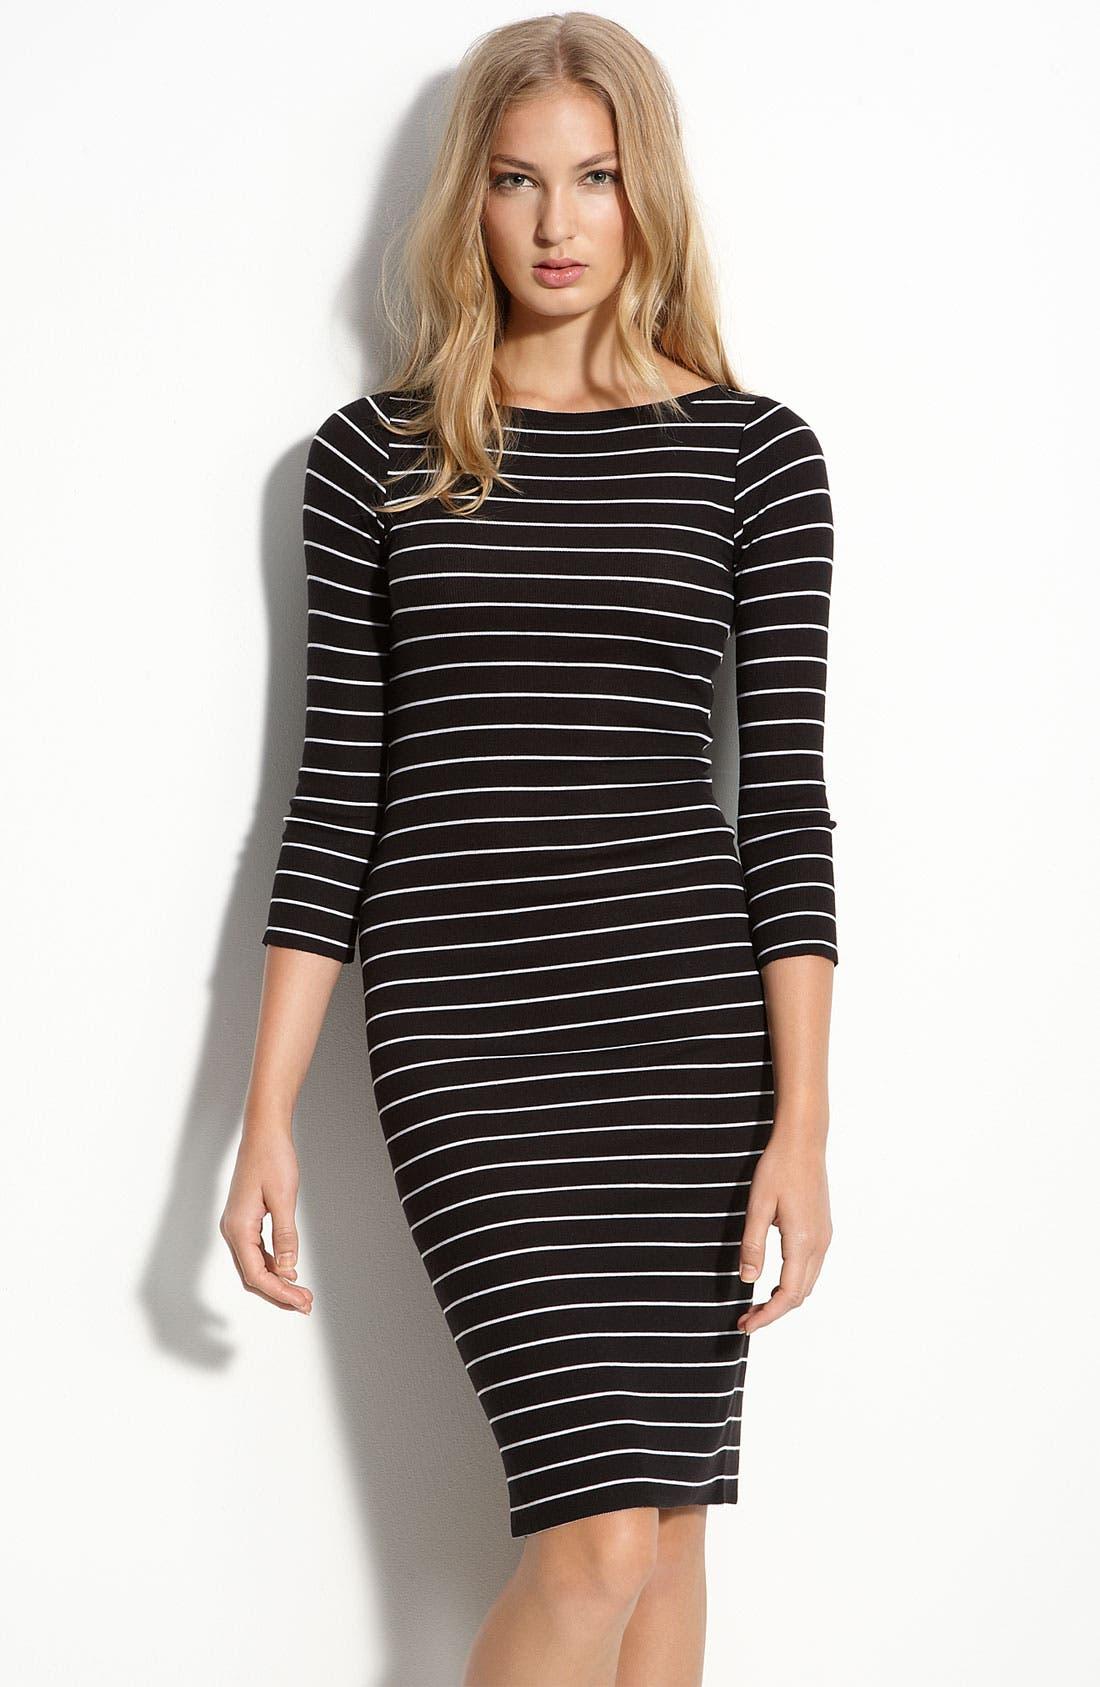 Alternate Image 1 Selected - BCBGMAXAZRIA Striped Knit Dress